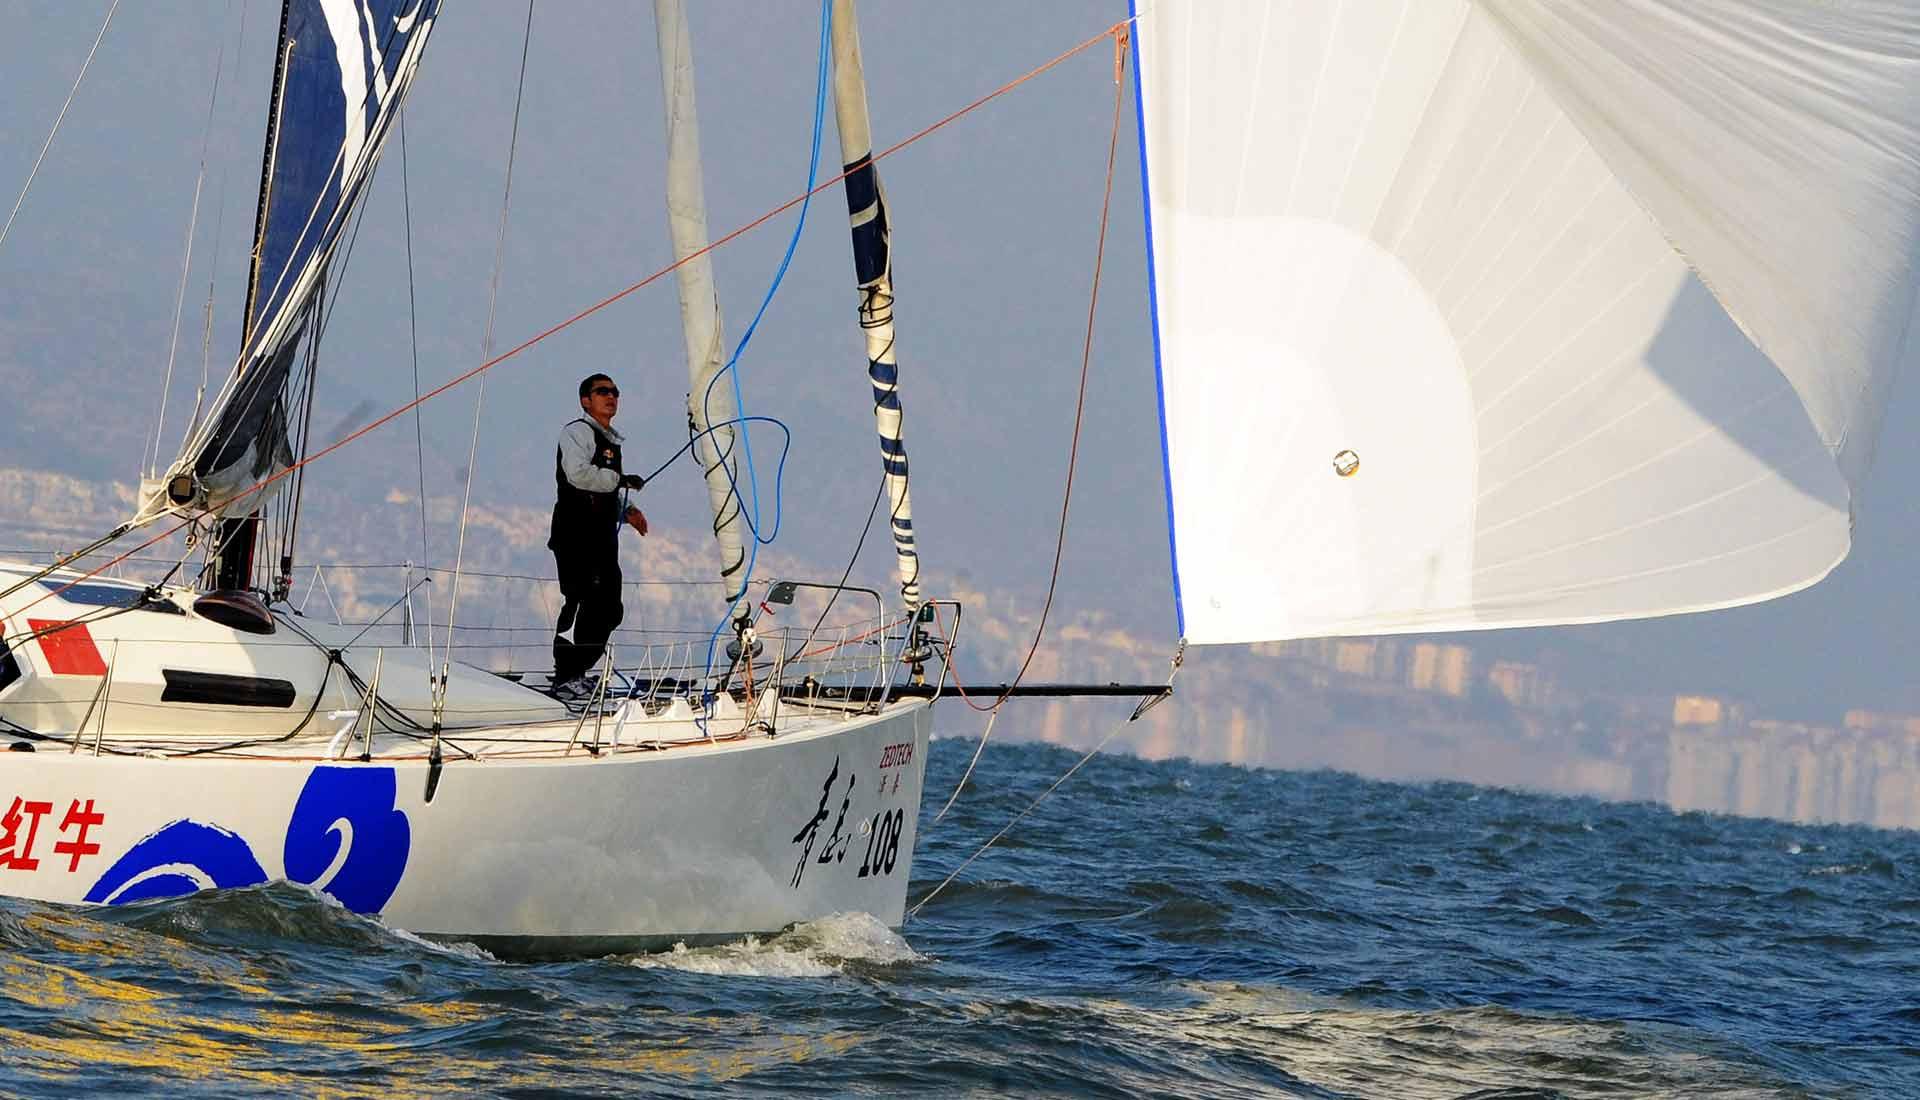 Gennaker Sailing his Class 40 QUINGDAO Racing Yacht